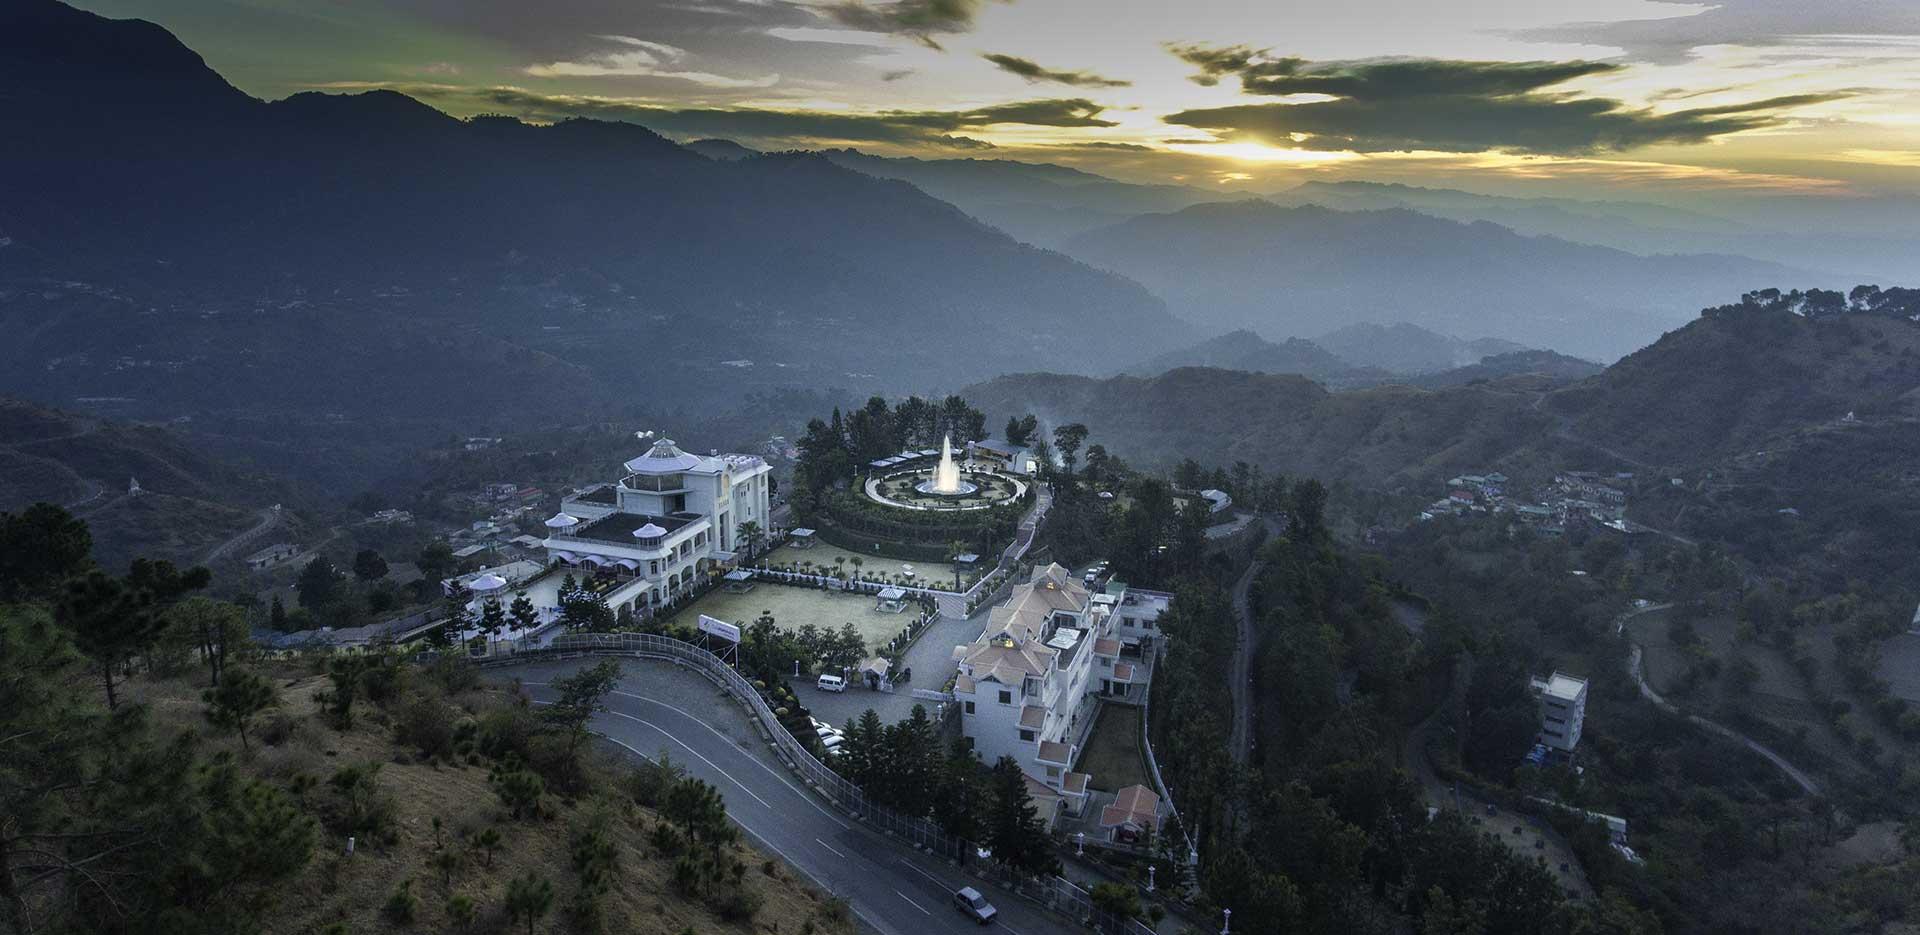 Club Mahindra Kandaghat Resort Shimla